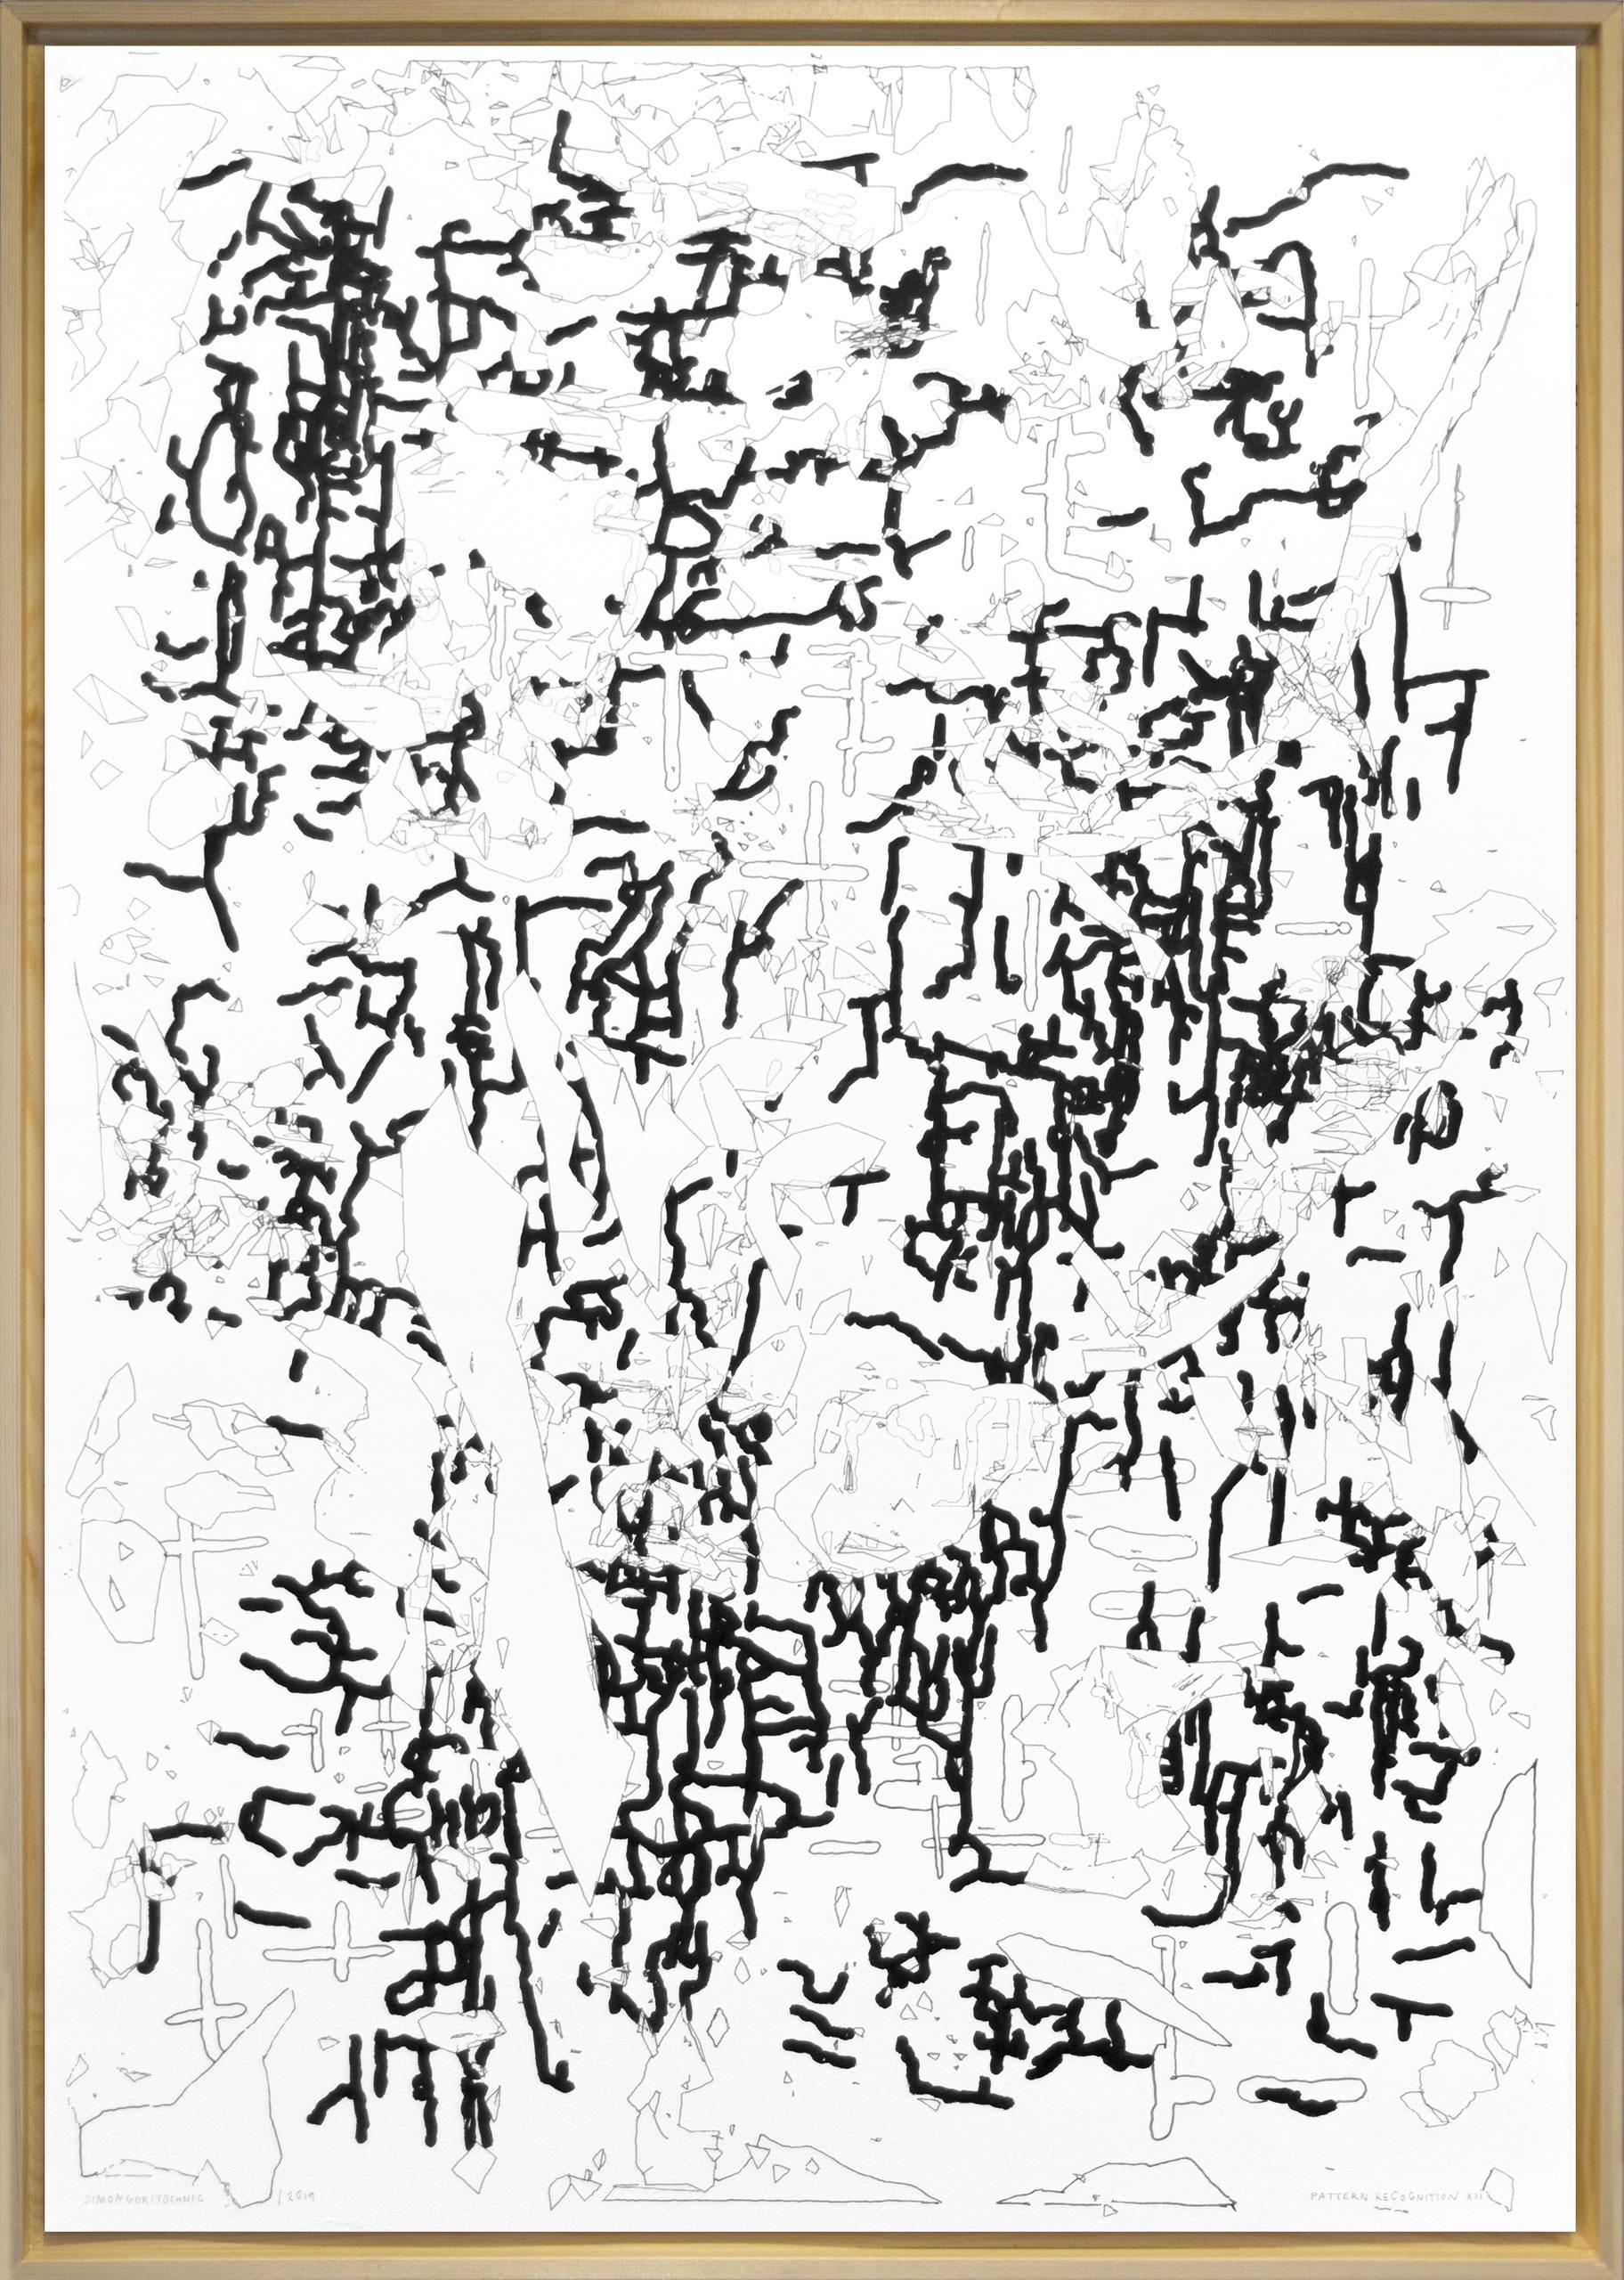 Simon Goritschnig | Pattern Recognition XII | 2019 | Galerie3